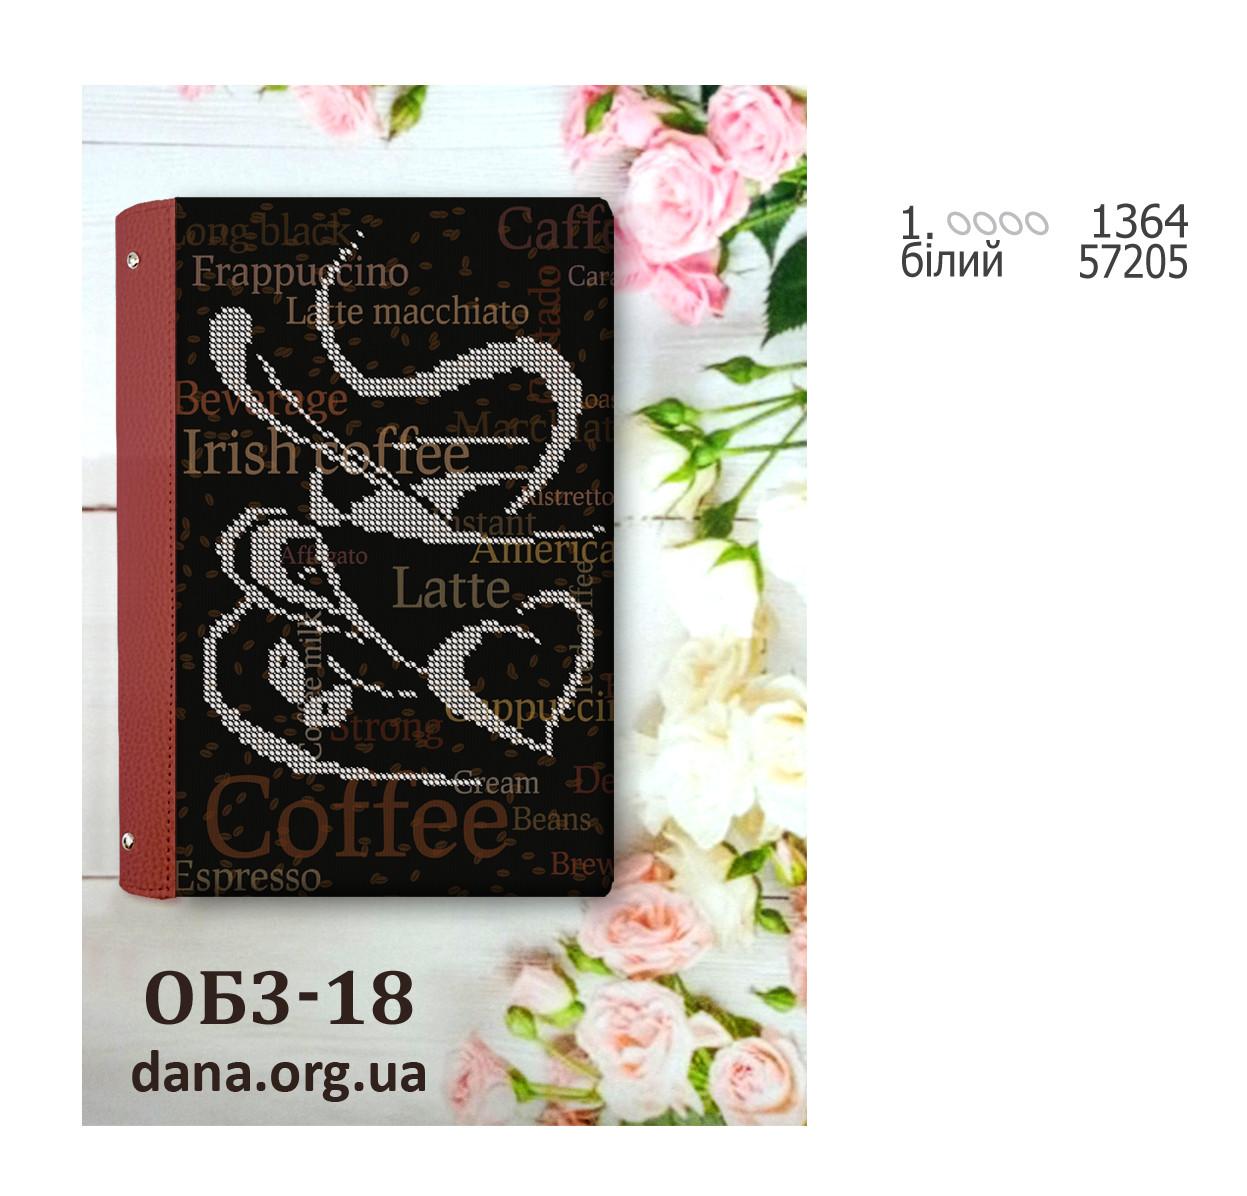 Обкладинка для книги DANA